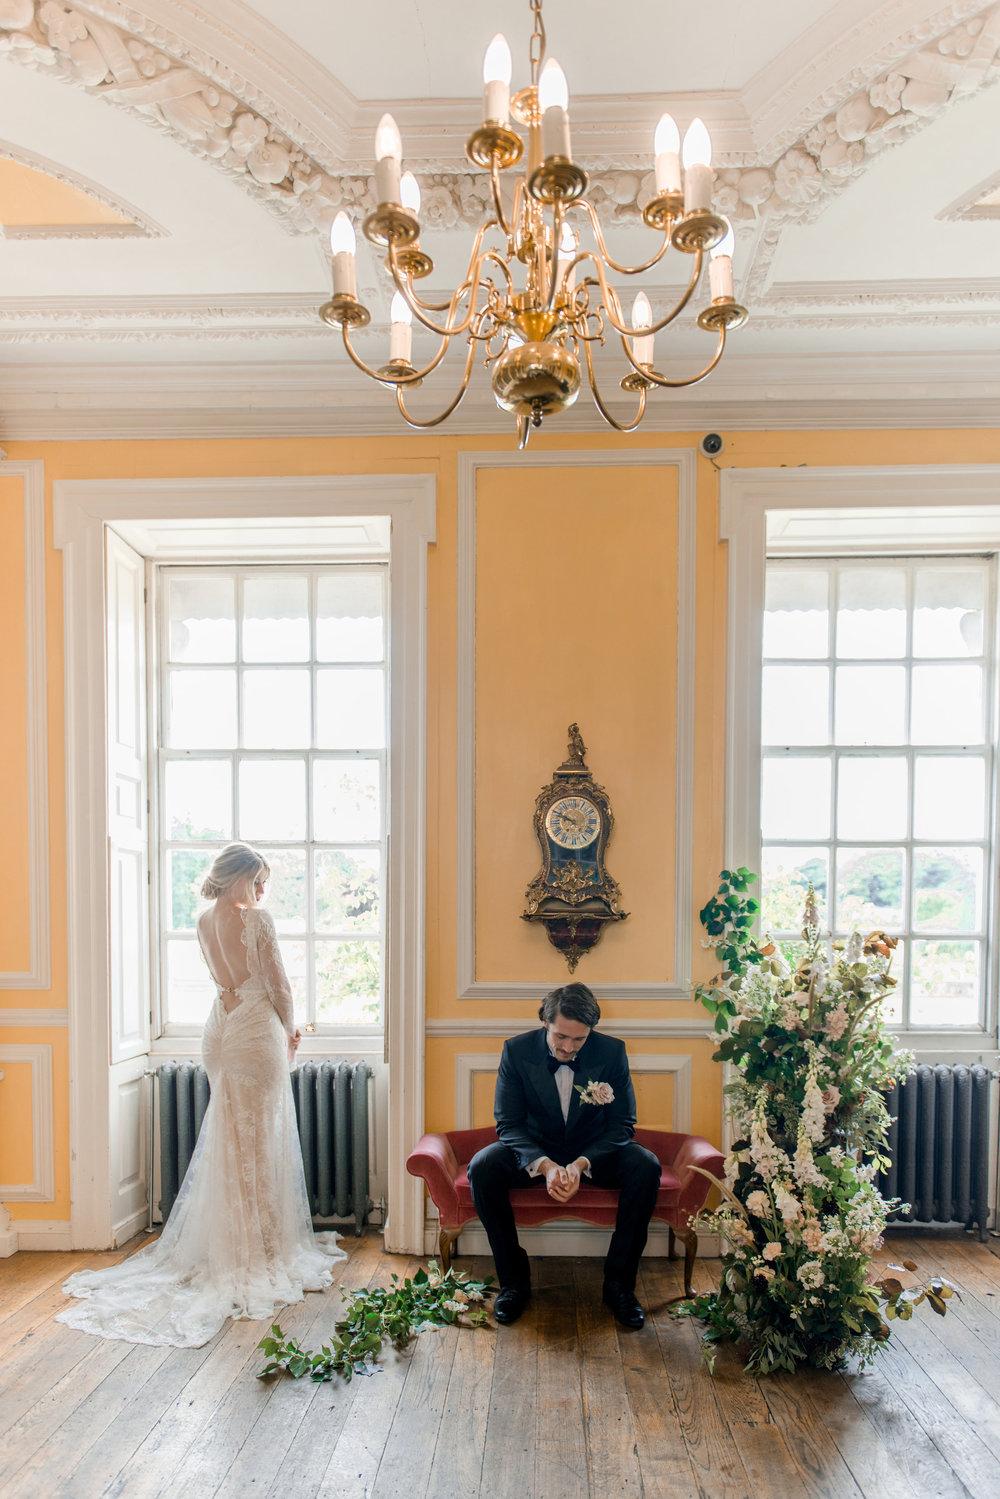 The Timeless Stylist-Elegant and Romantic Wedding Styling-Stately Home Ballroom Wedding Inspiration